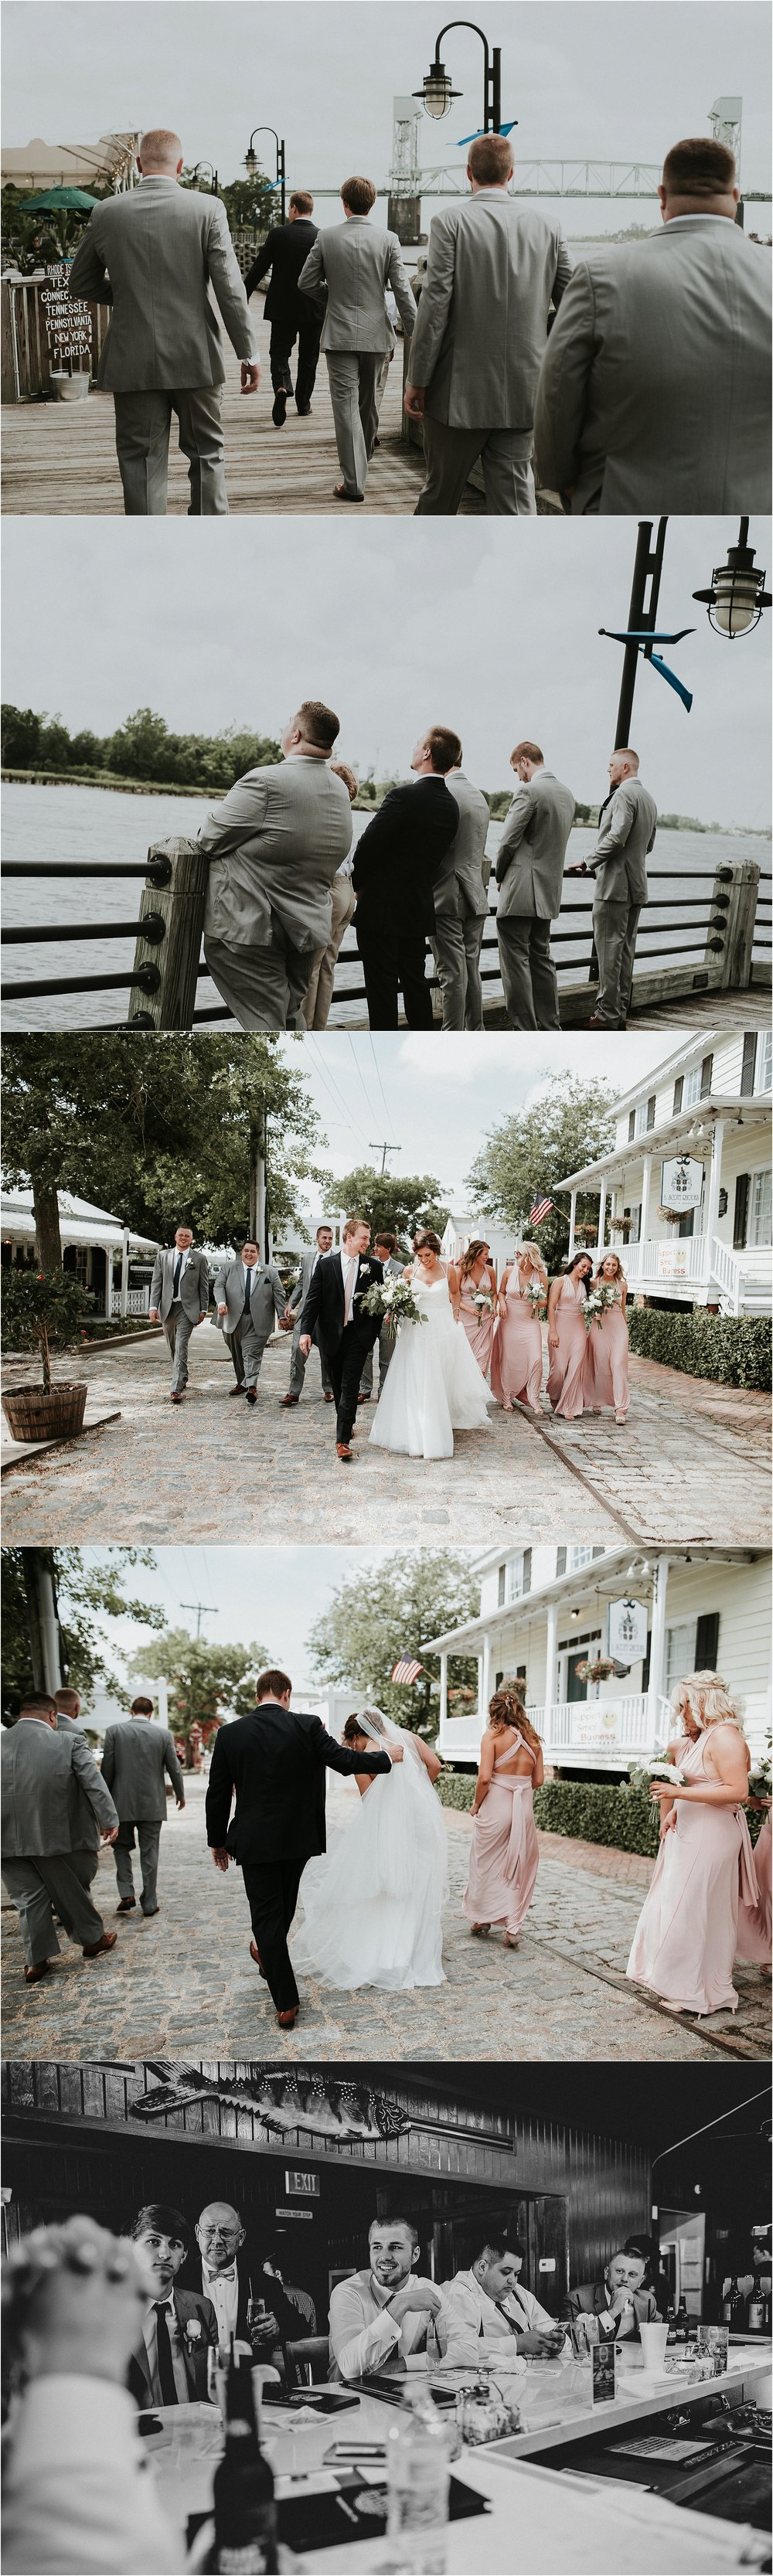 Riverwalk-Landing-wedding-wilmington-NC_0023.jpg